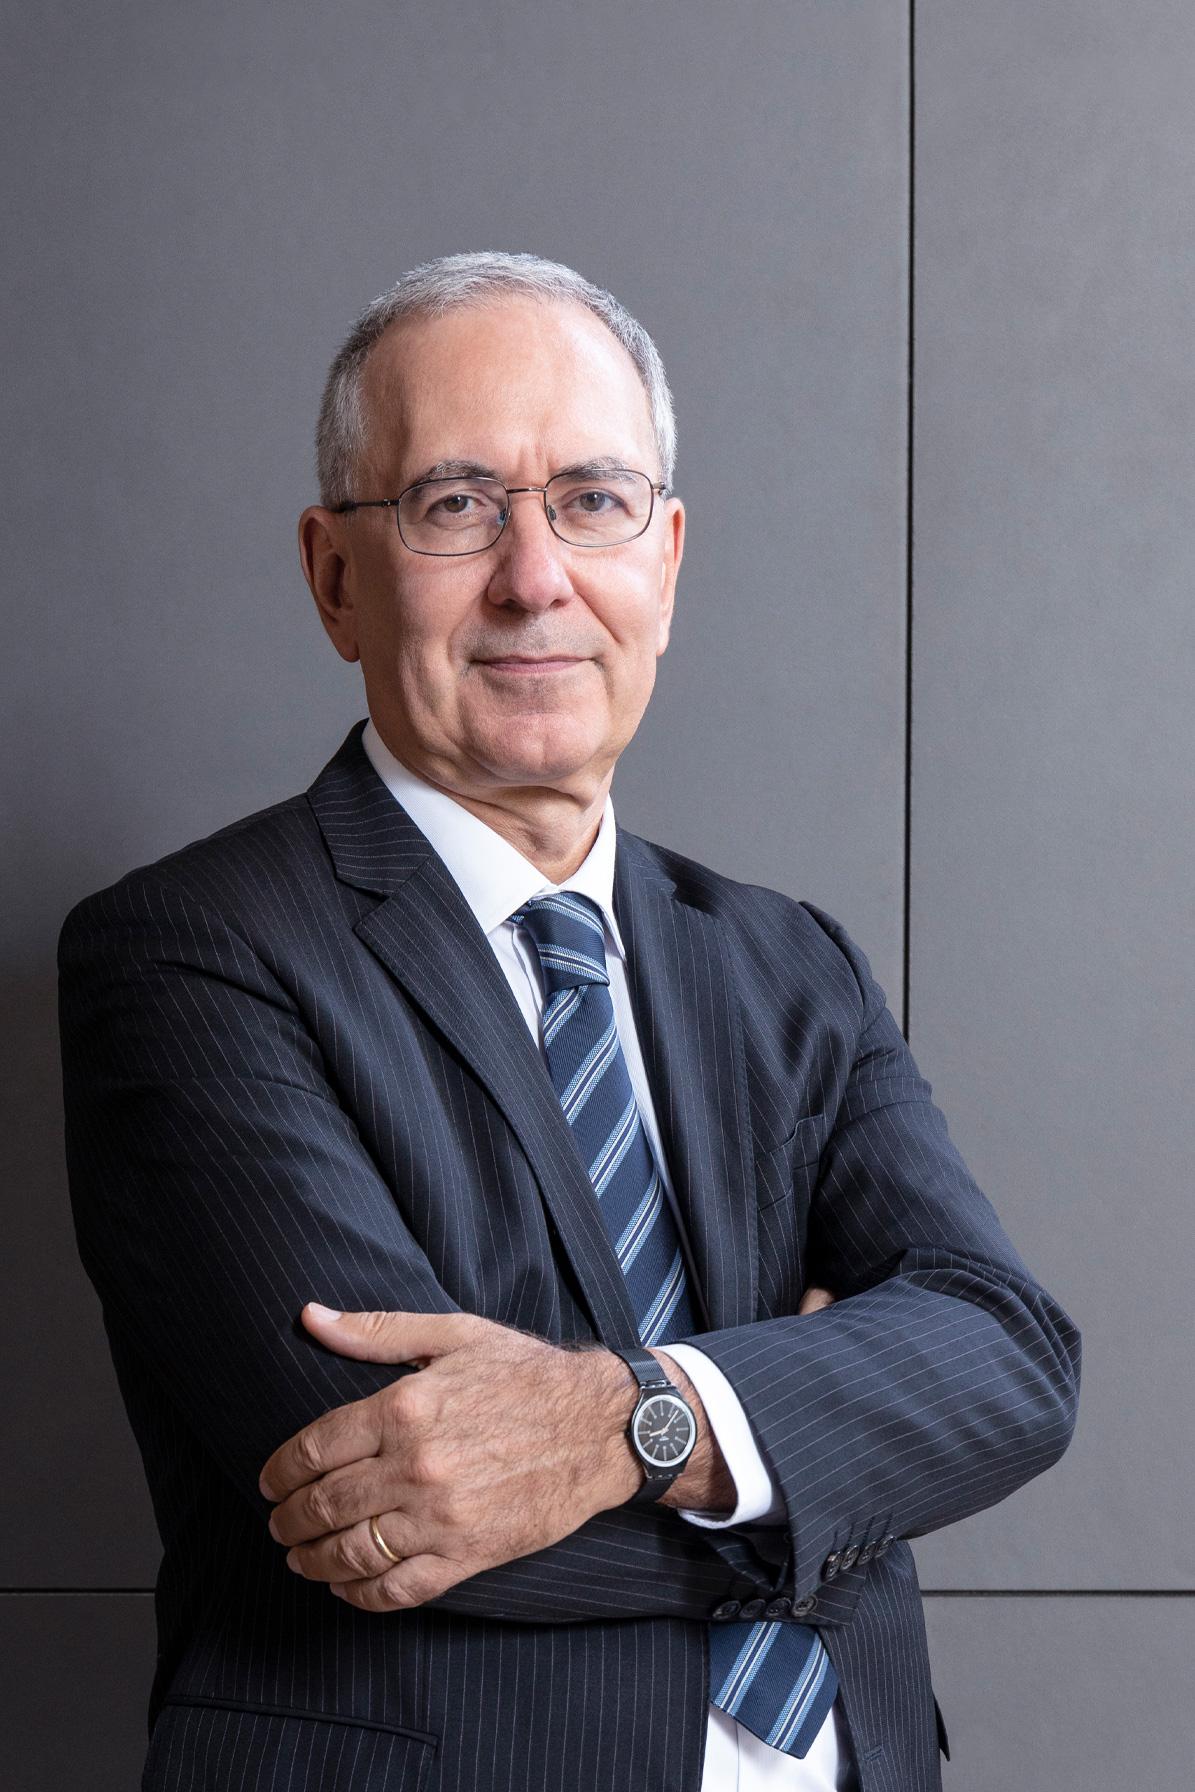 Fabio Michielon